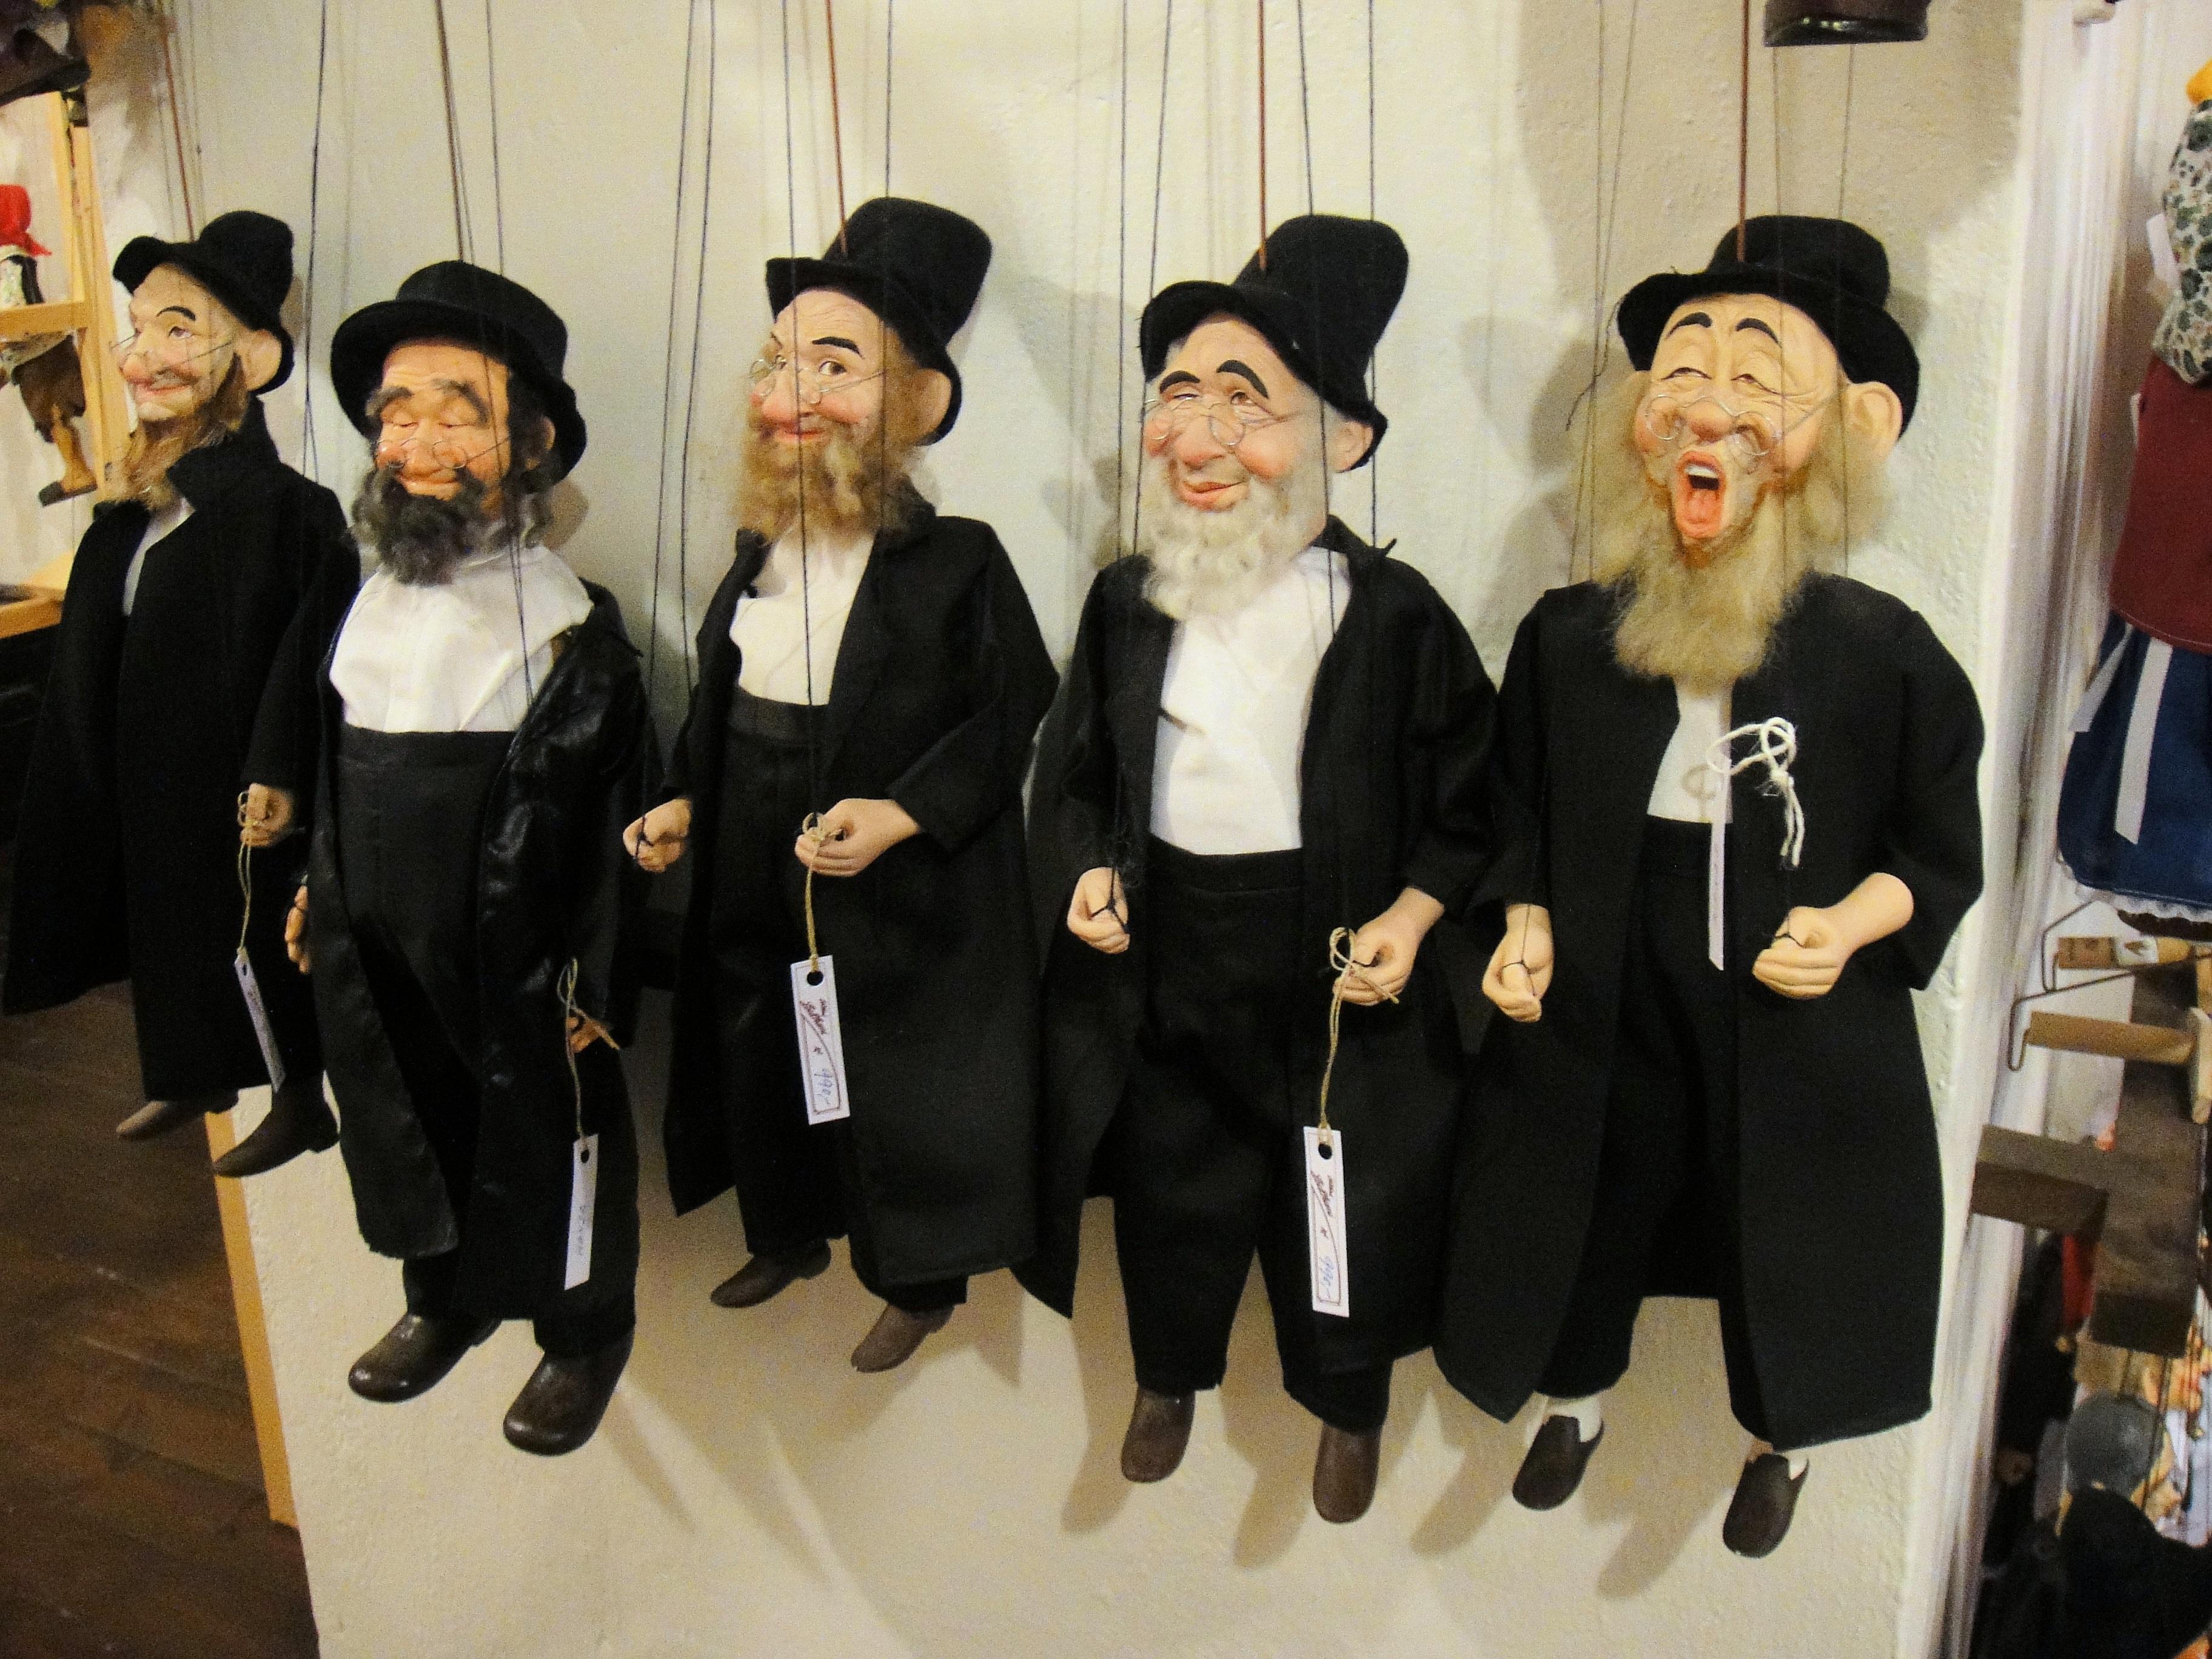 Gambar Wayang Boneka Karikatur Wisuda Yahudi Ibrani Gaun